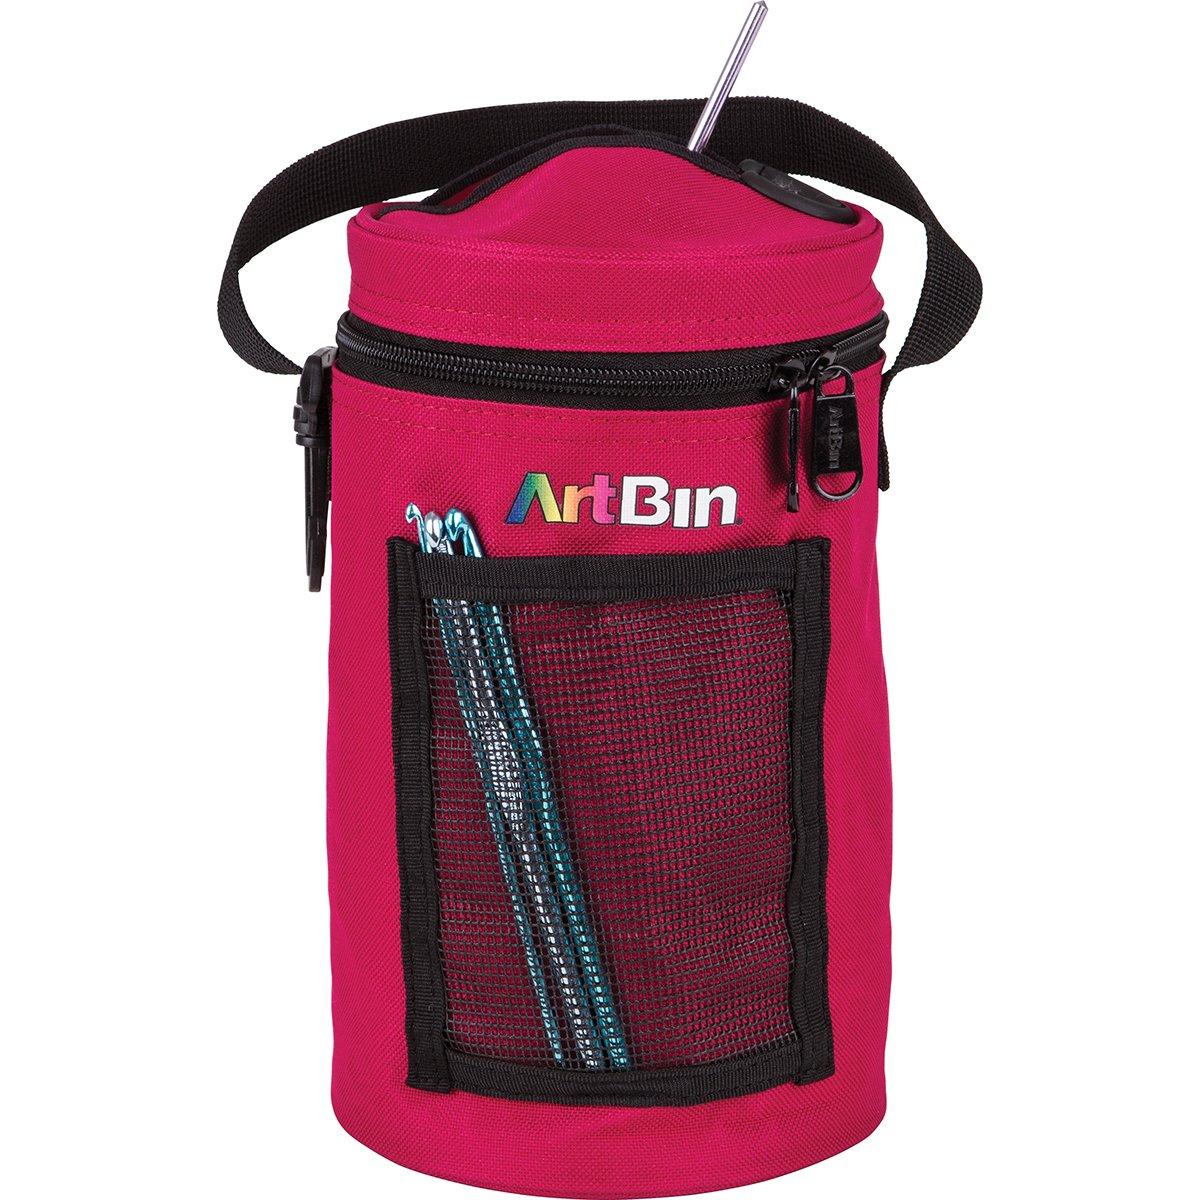 4a89131e3b8 ArtBin Mini Yarn Drum Knitting and Crochet Tote Bag, Raspberry 6831AG